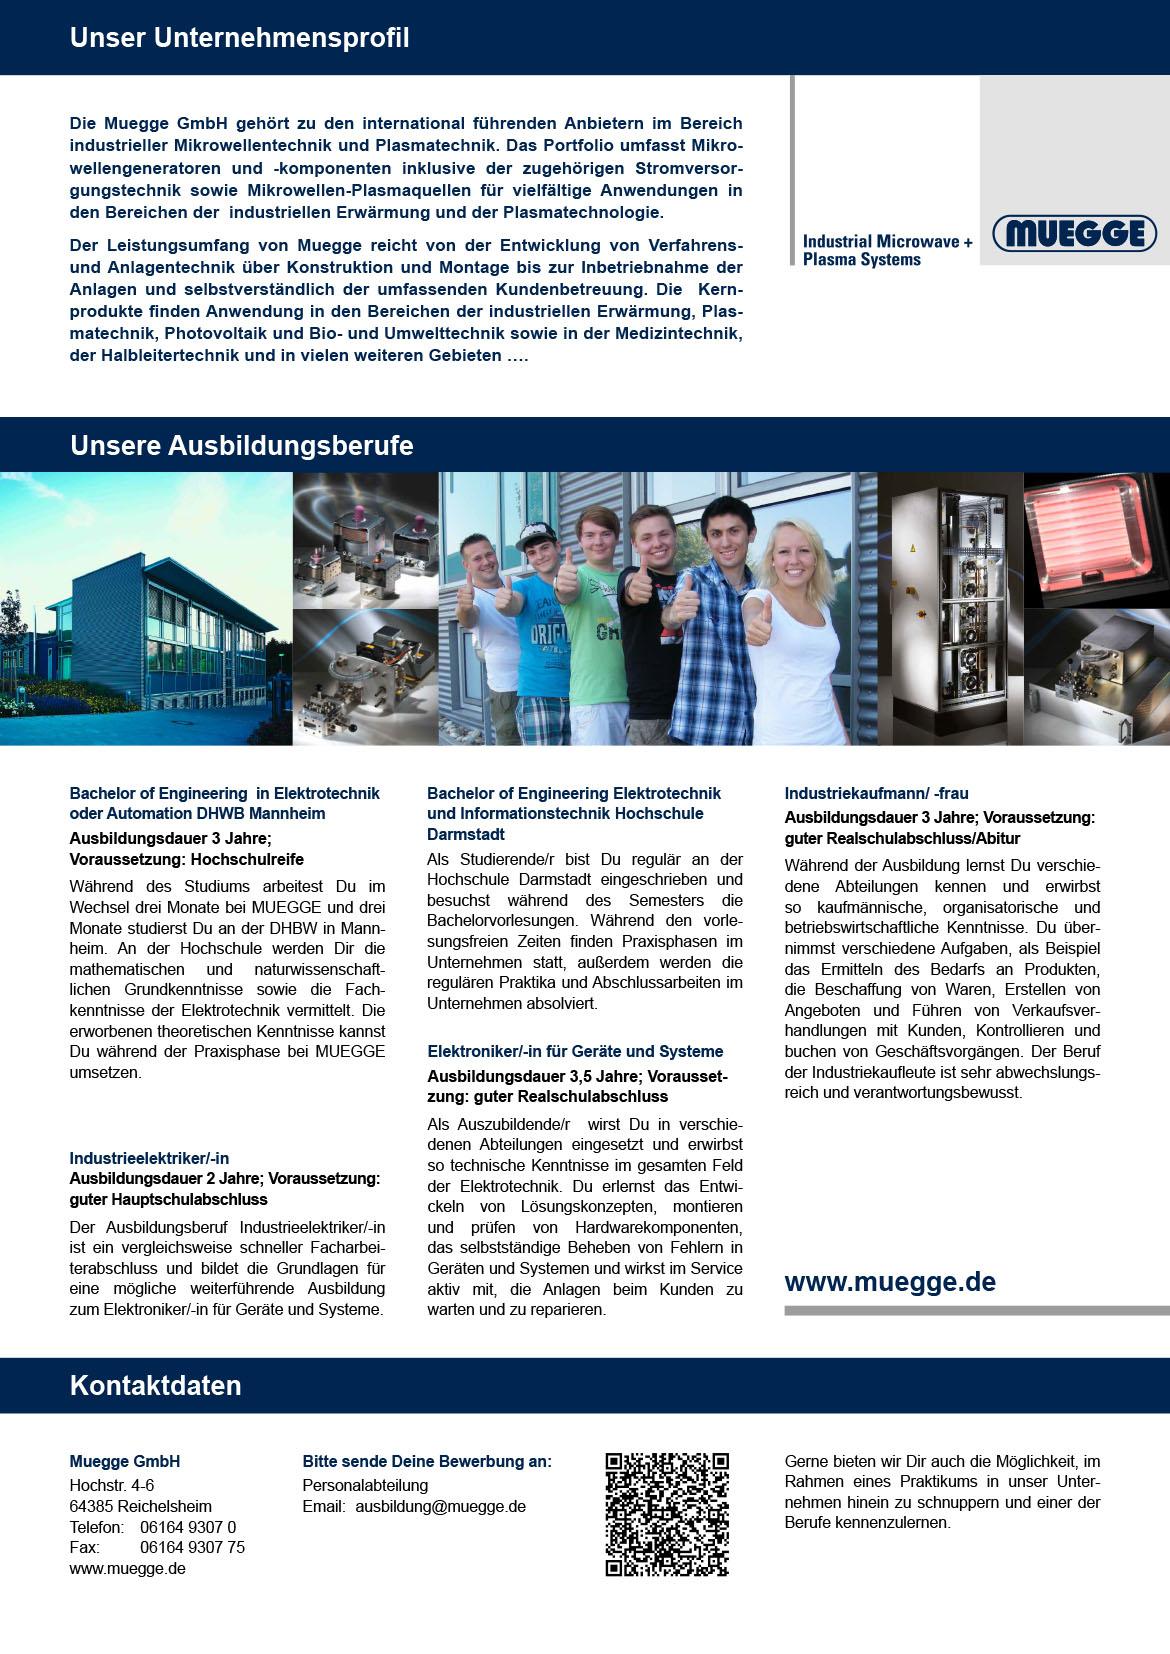 Ausbildungsplakat: Muegge GmbH